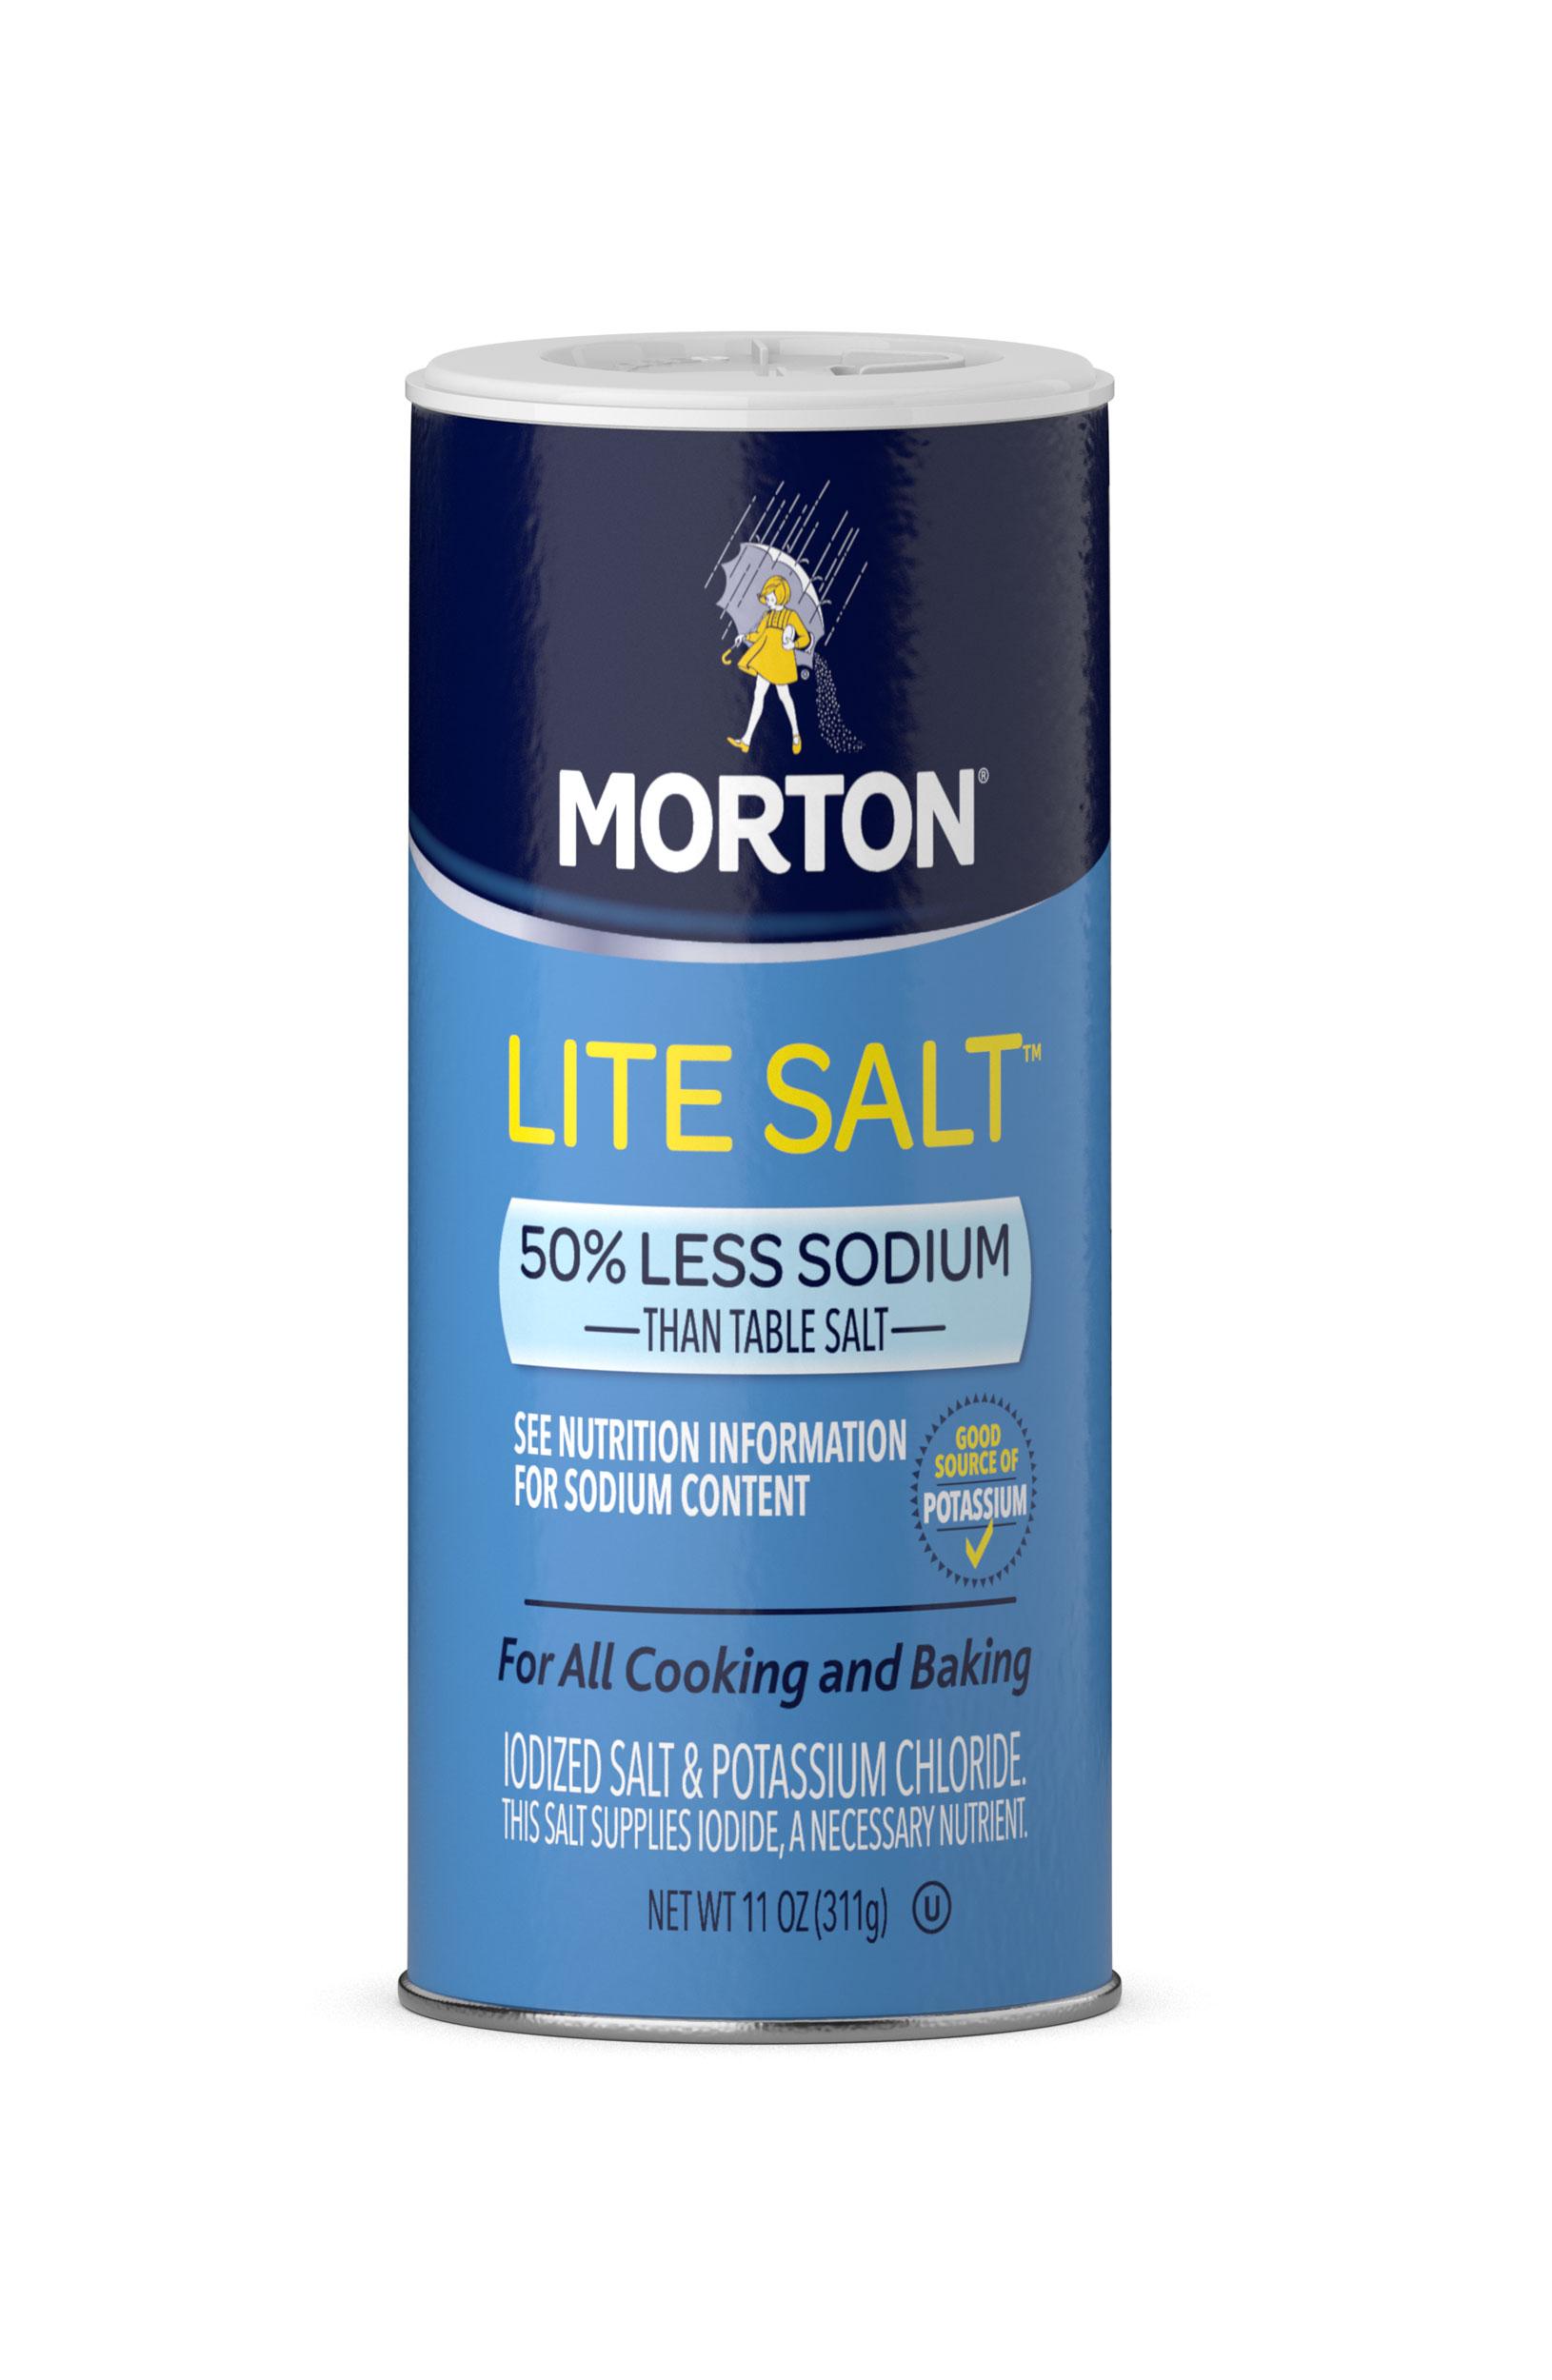 professional cgi photo of salt